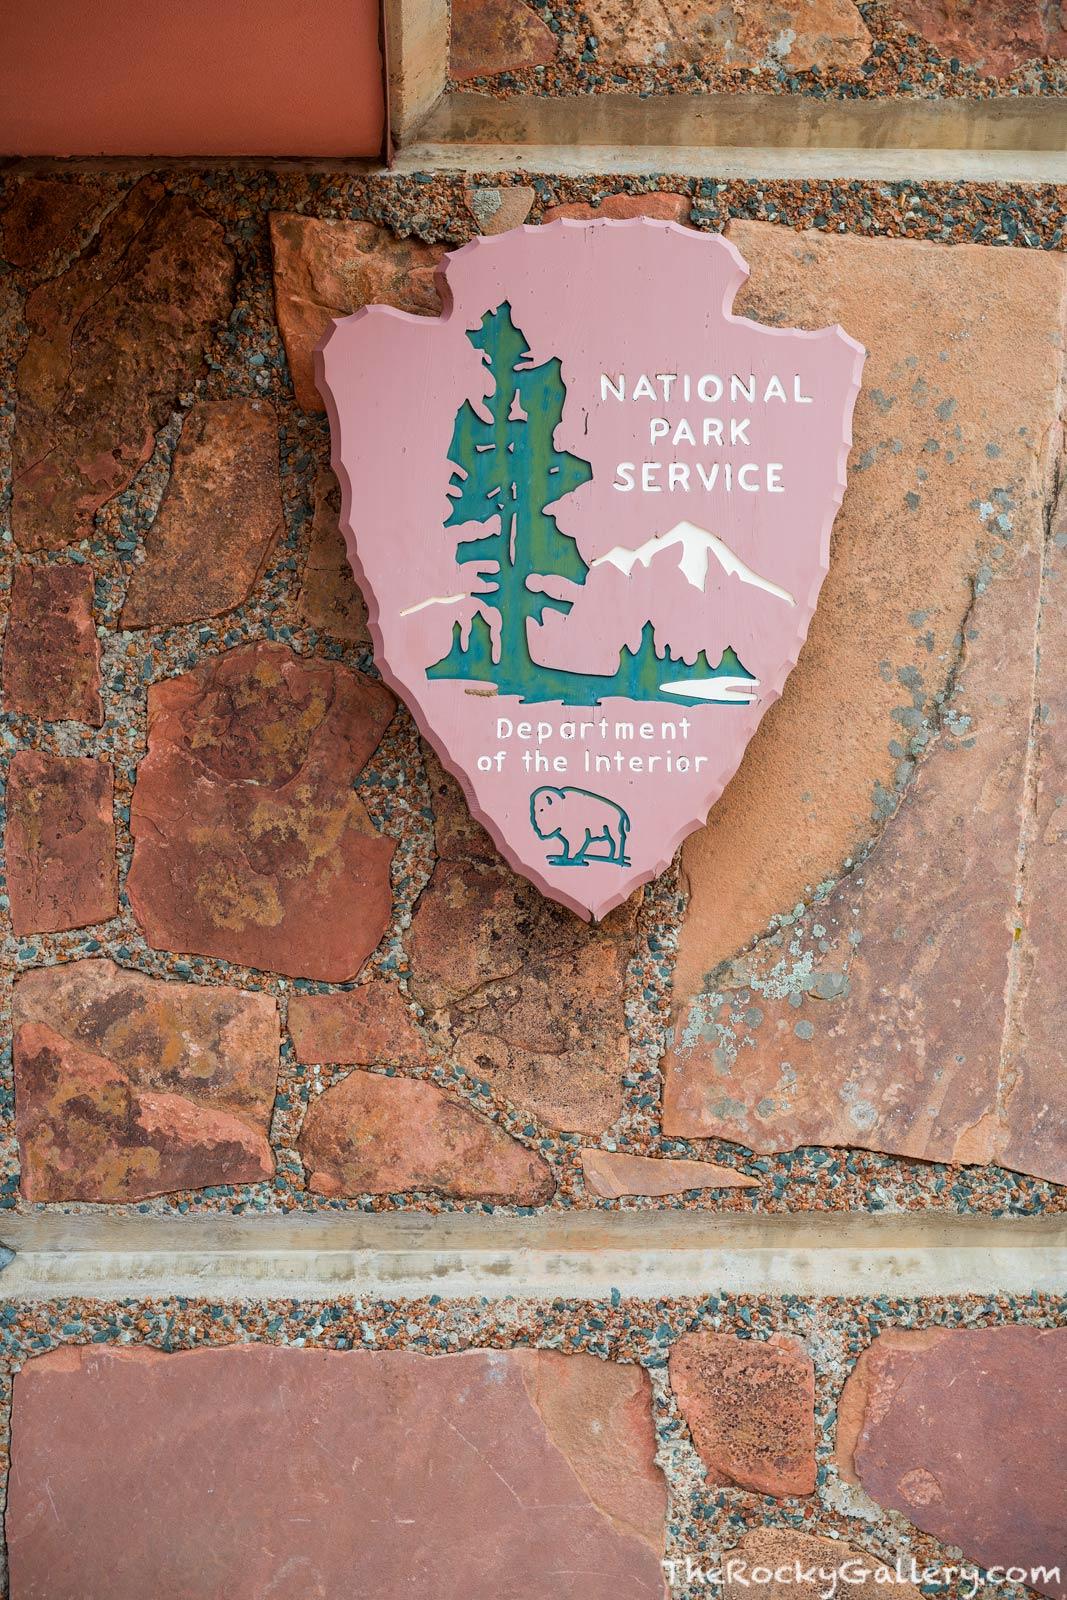 NPS,National Park Service,Signage,Symbol,Arrowhead,Beaver Meadows Visitor Center,Frank Lloyd Wright,RMNP,Estes Park,Trail Ridge Road,Colorado,Rocky Mountain National Park,Landscape,Photography,Protect, photo